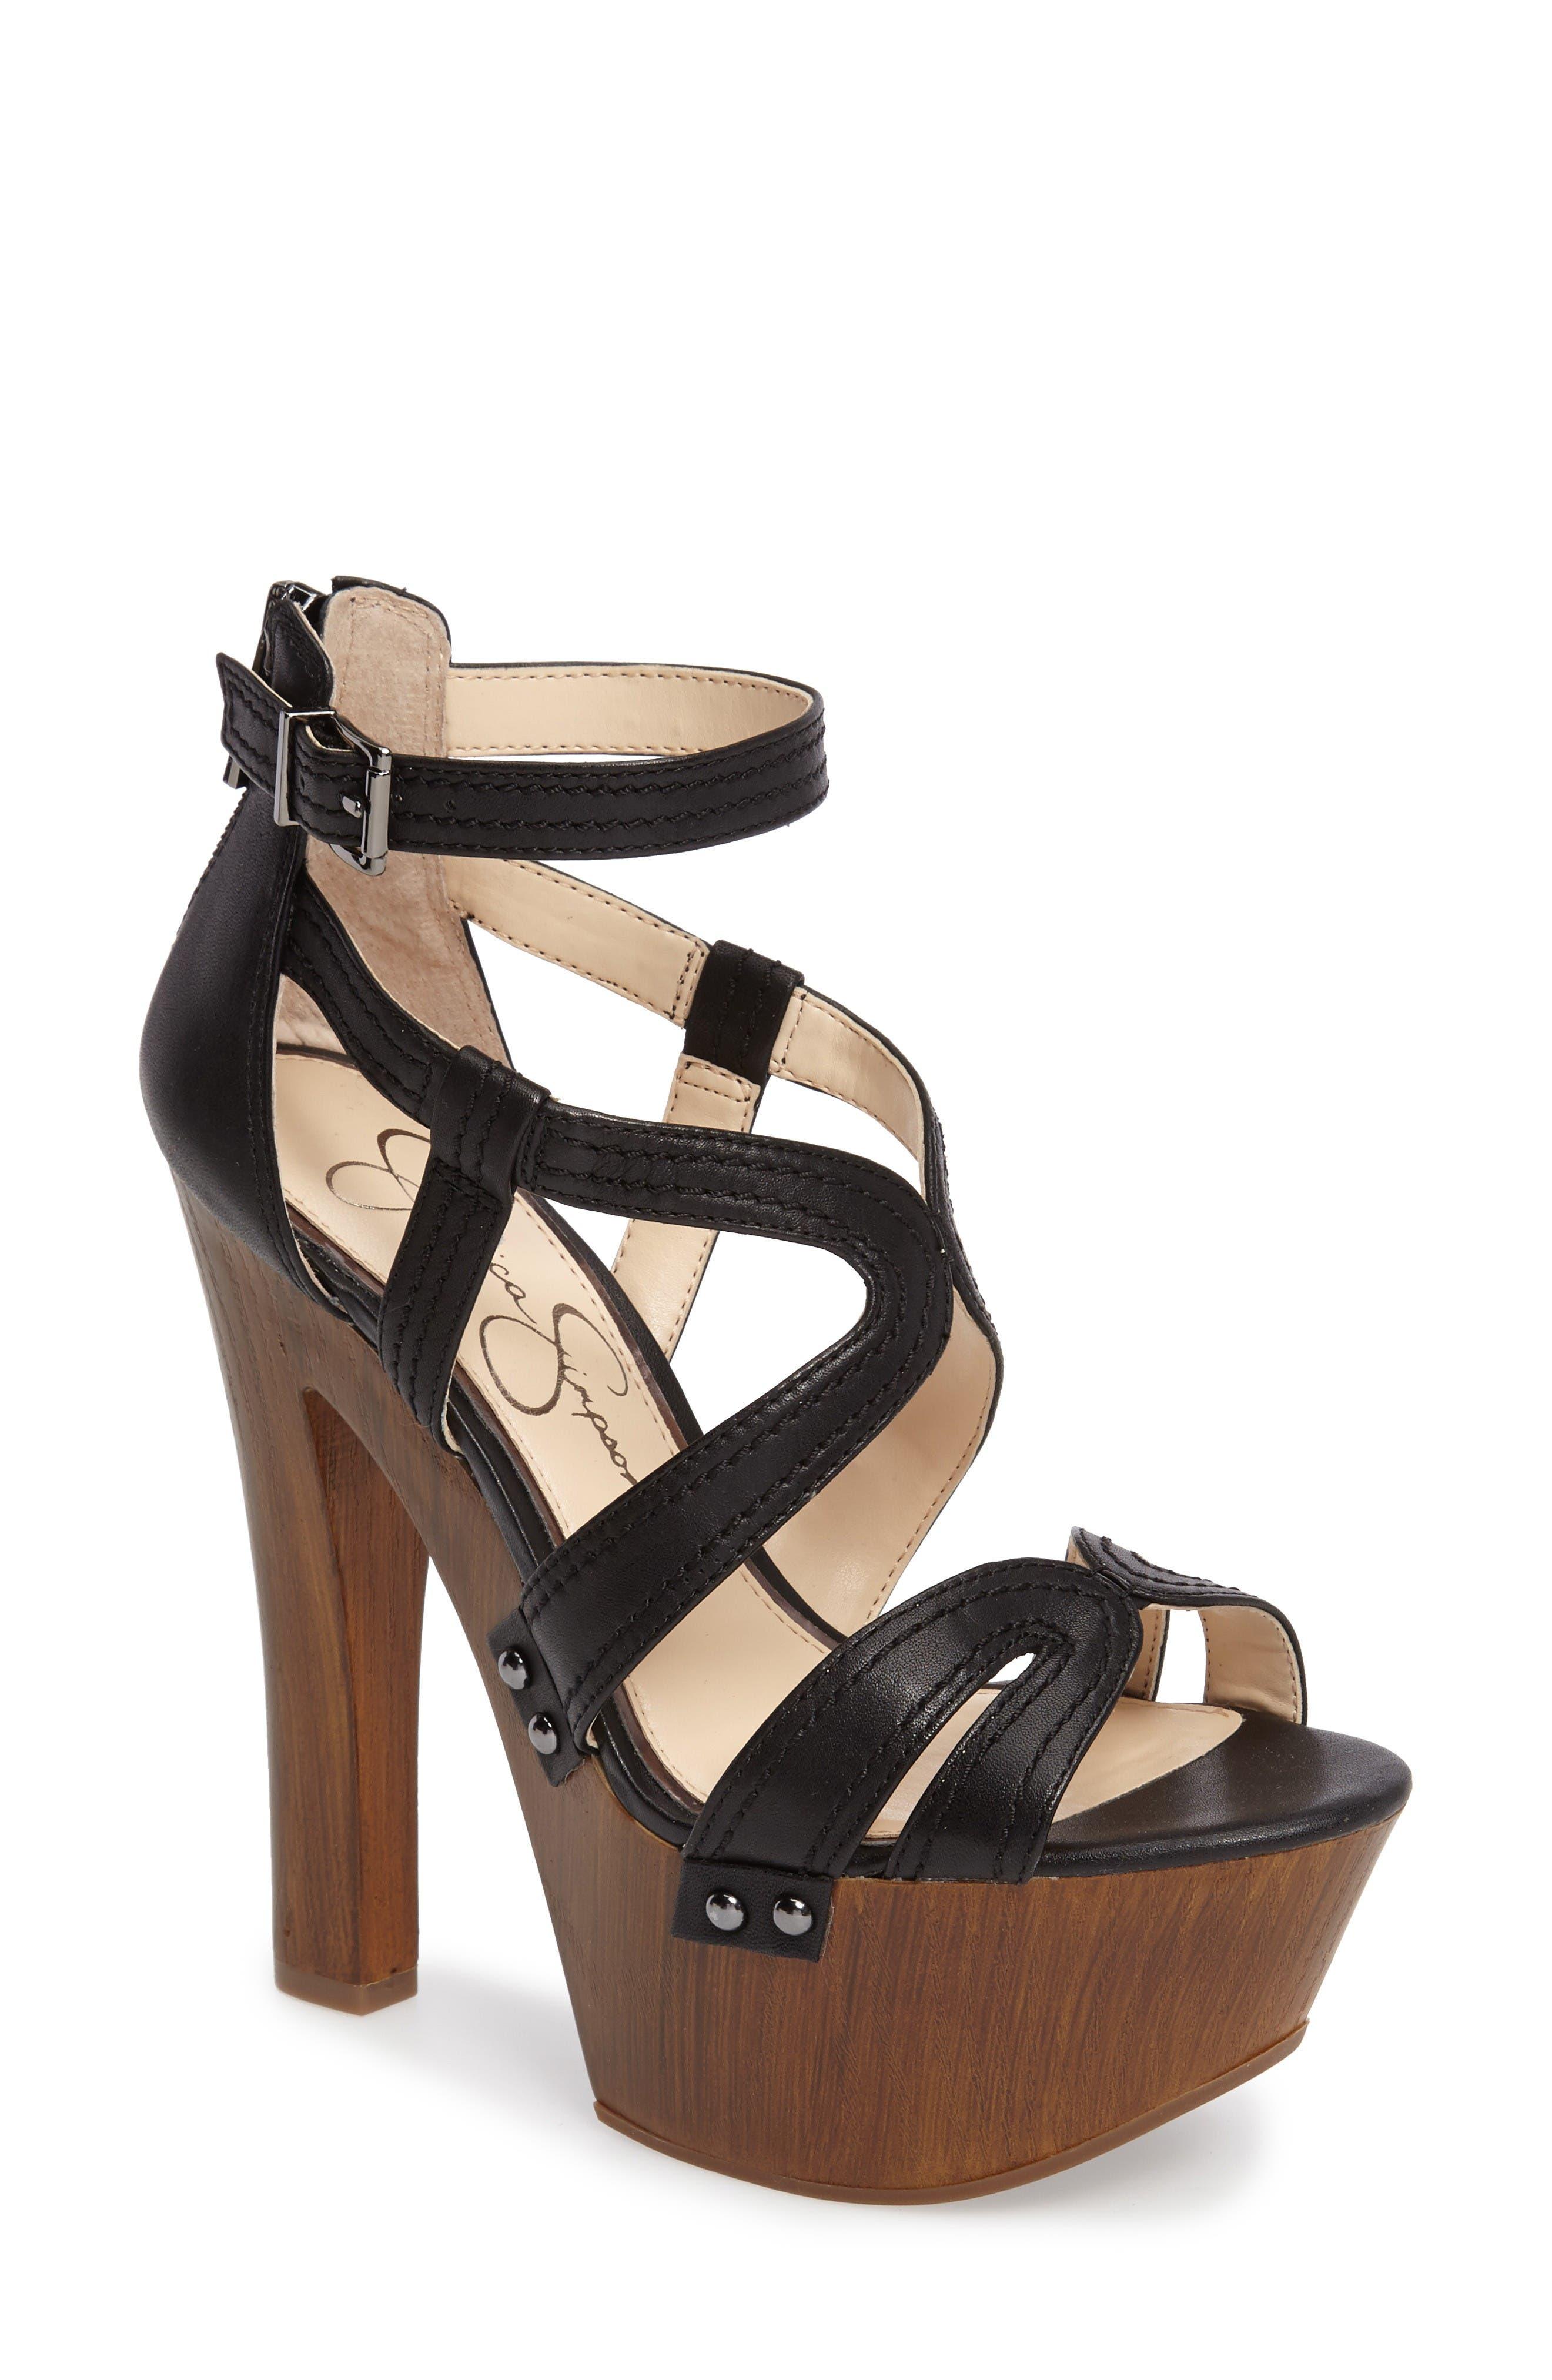 Main Image - Jessica Simpson Dorrin Platform Sandal (Women)